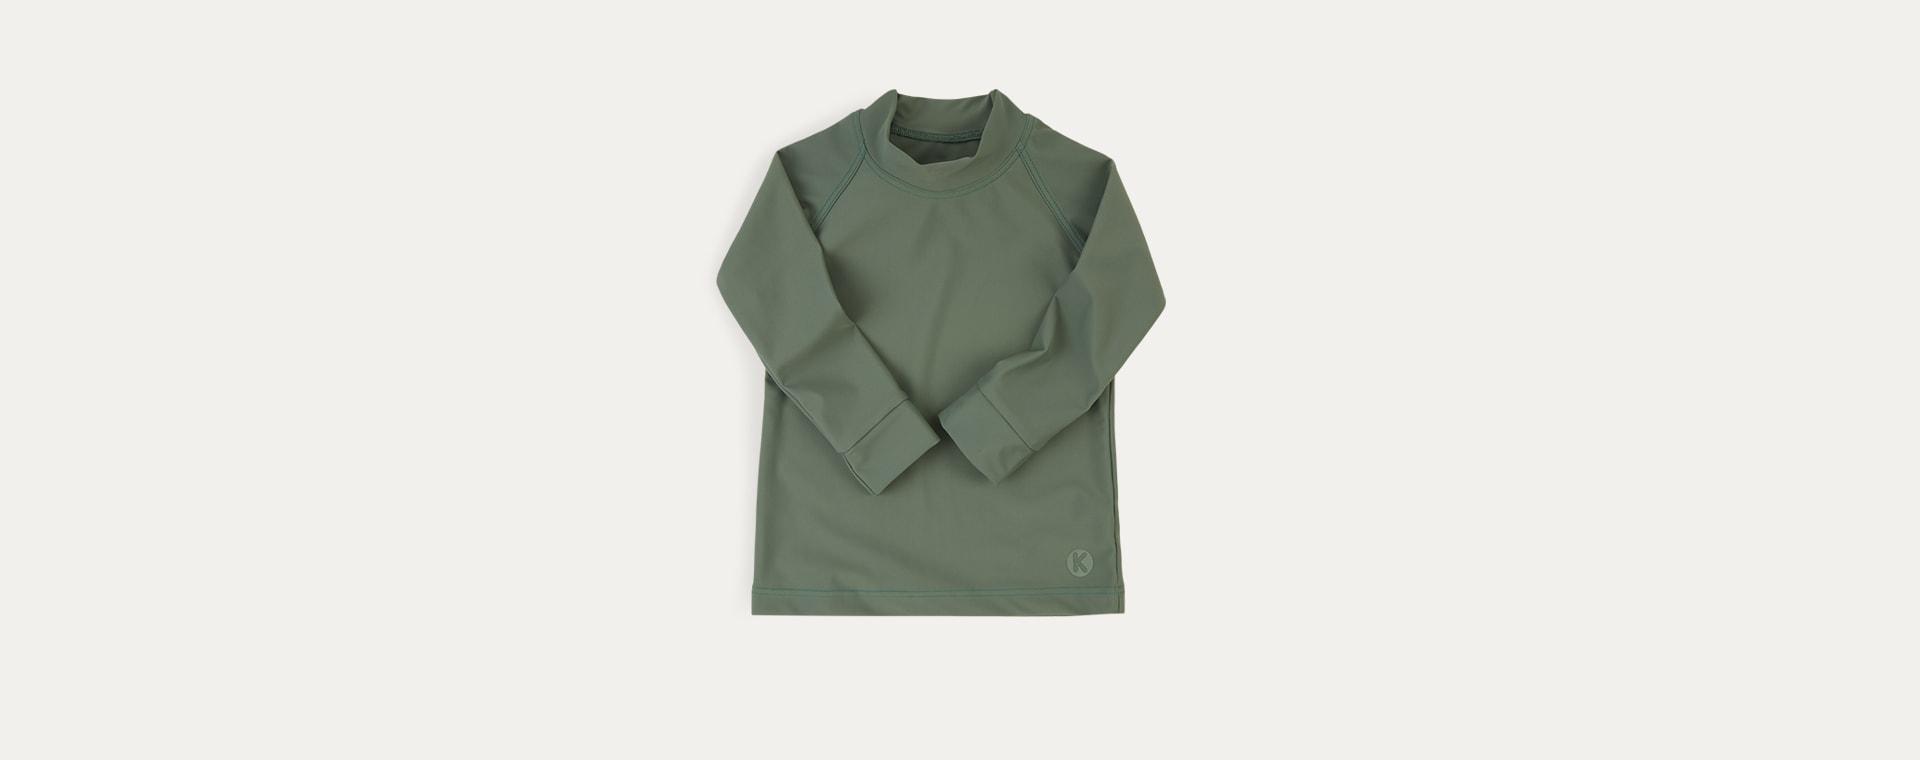 Olive KIDLY Label Recycled Rash Vest